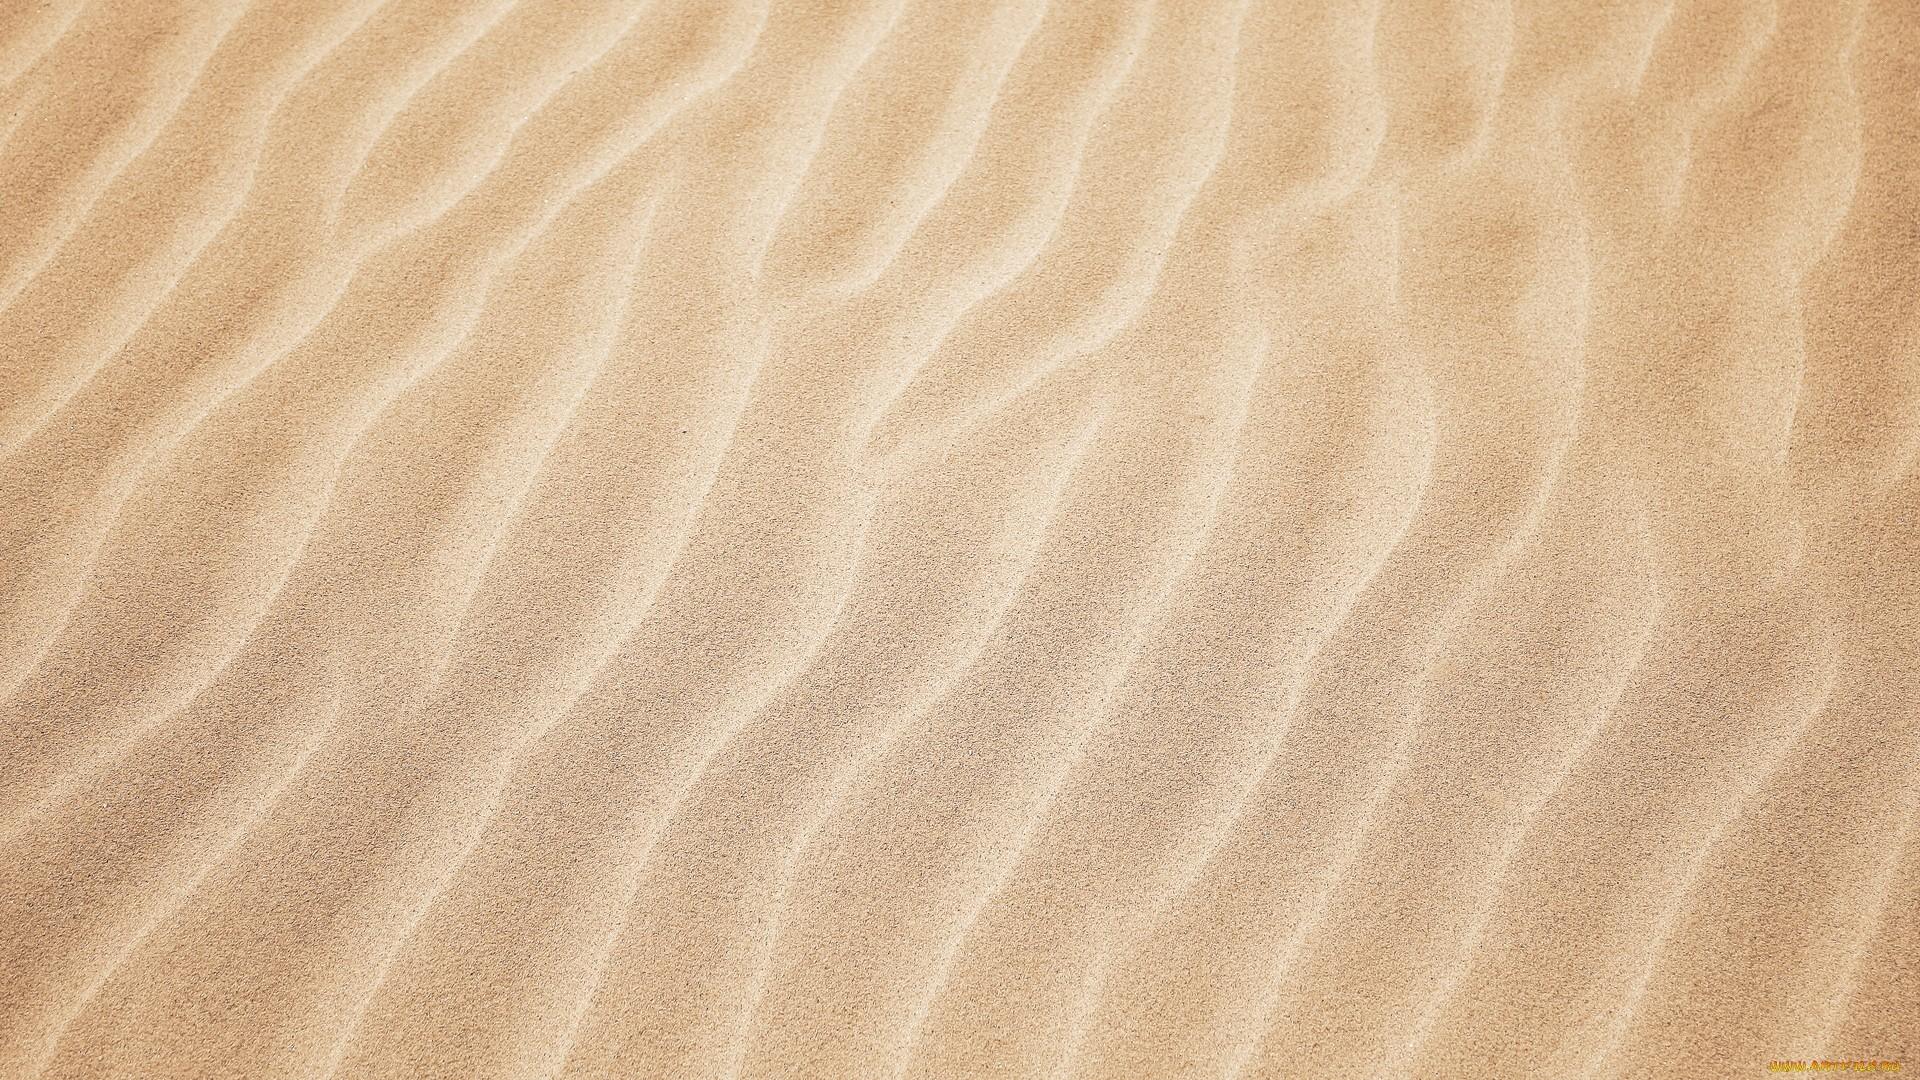 Sand Desktop Wallpaper